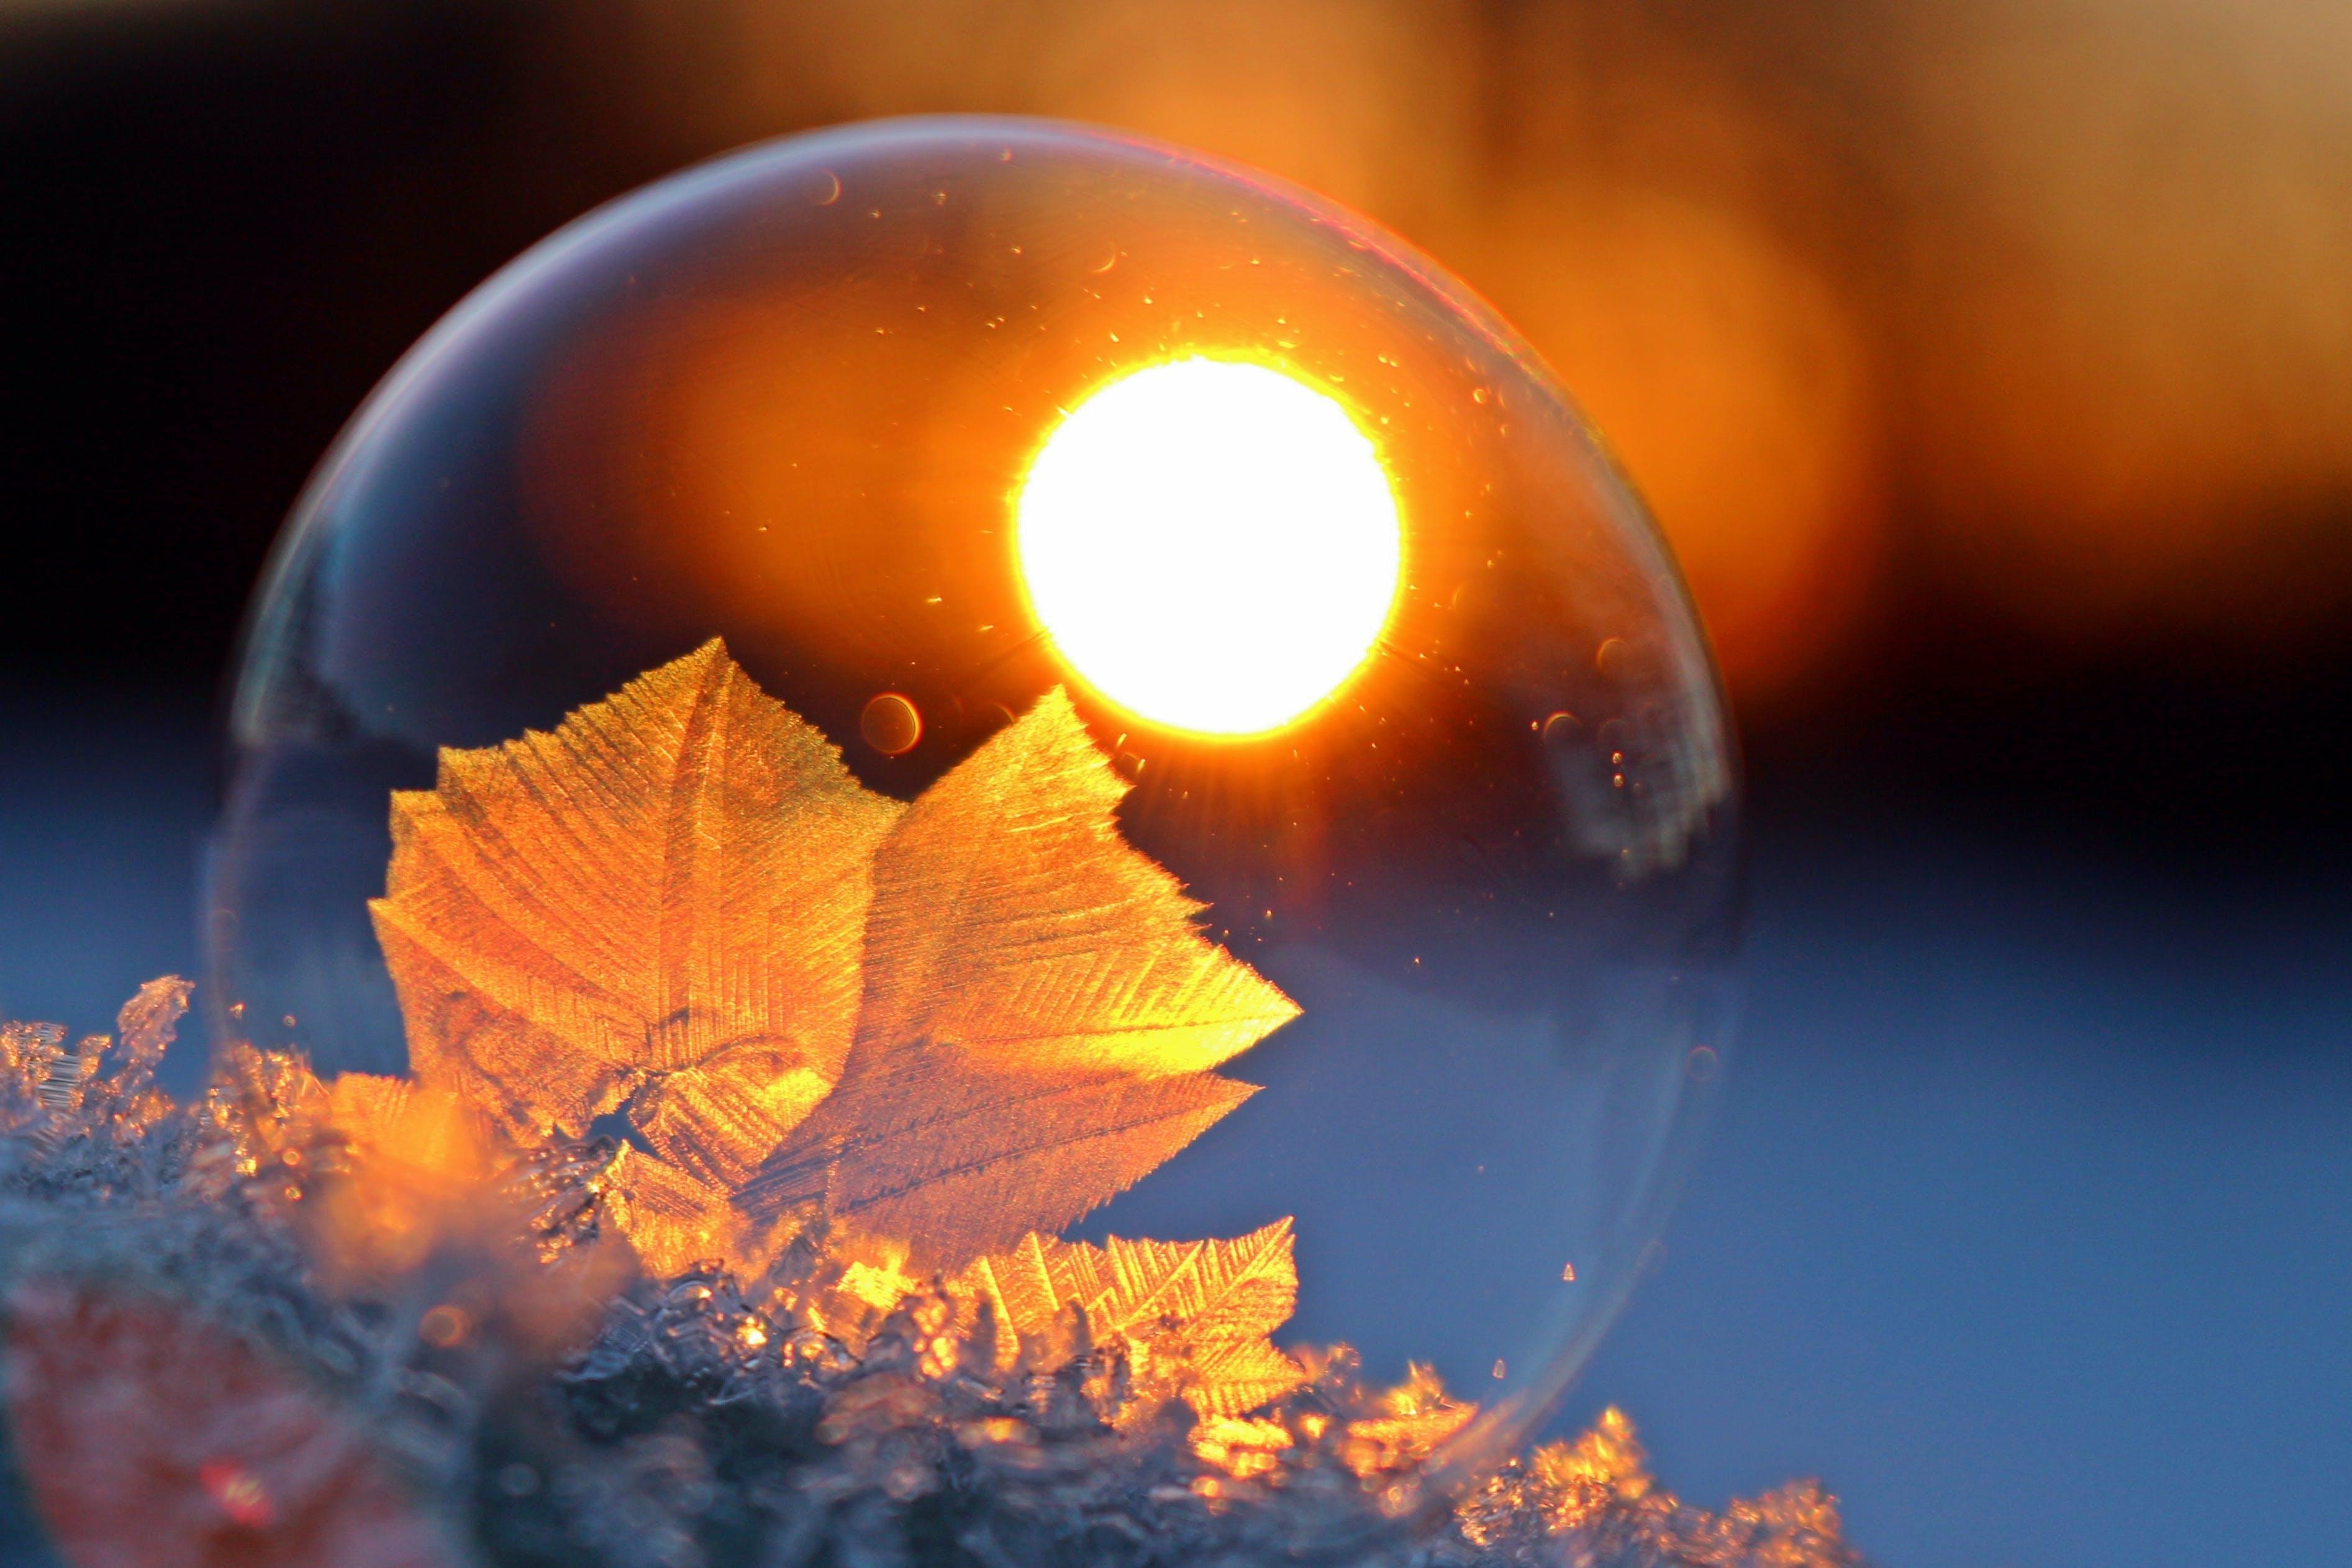 Free stock photo of sunset, winter, frozen, ball